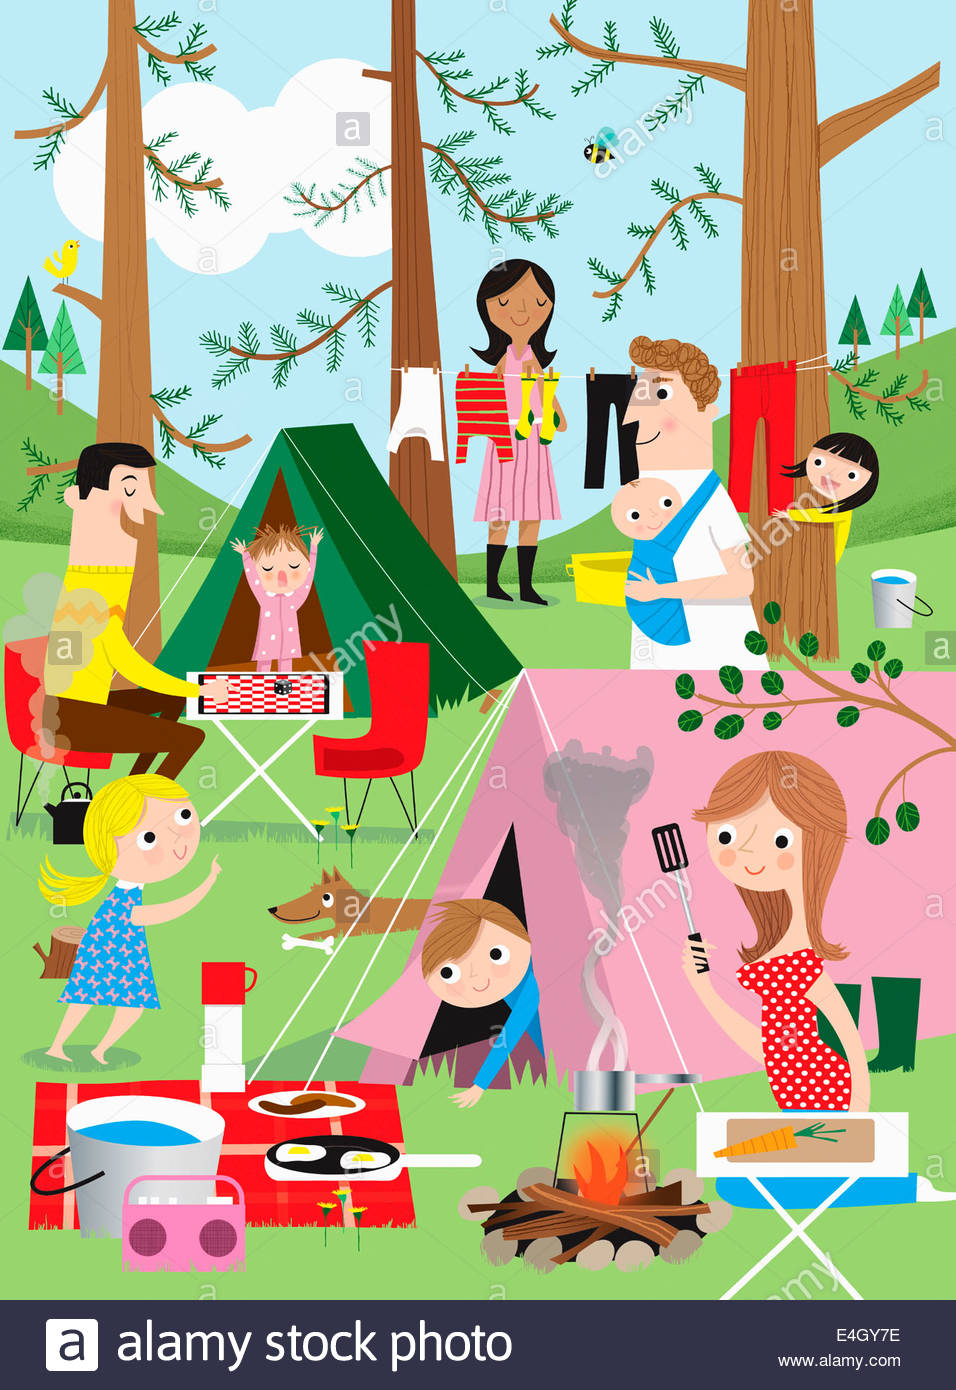 Families having fun camping in woods - Stock Image